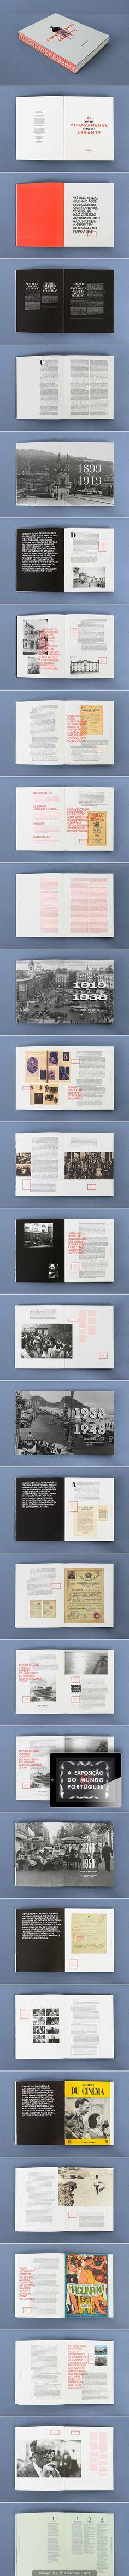 "Interactive printing Book ""O Vimaranense Errante"" - Atelier Martino & Jana"